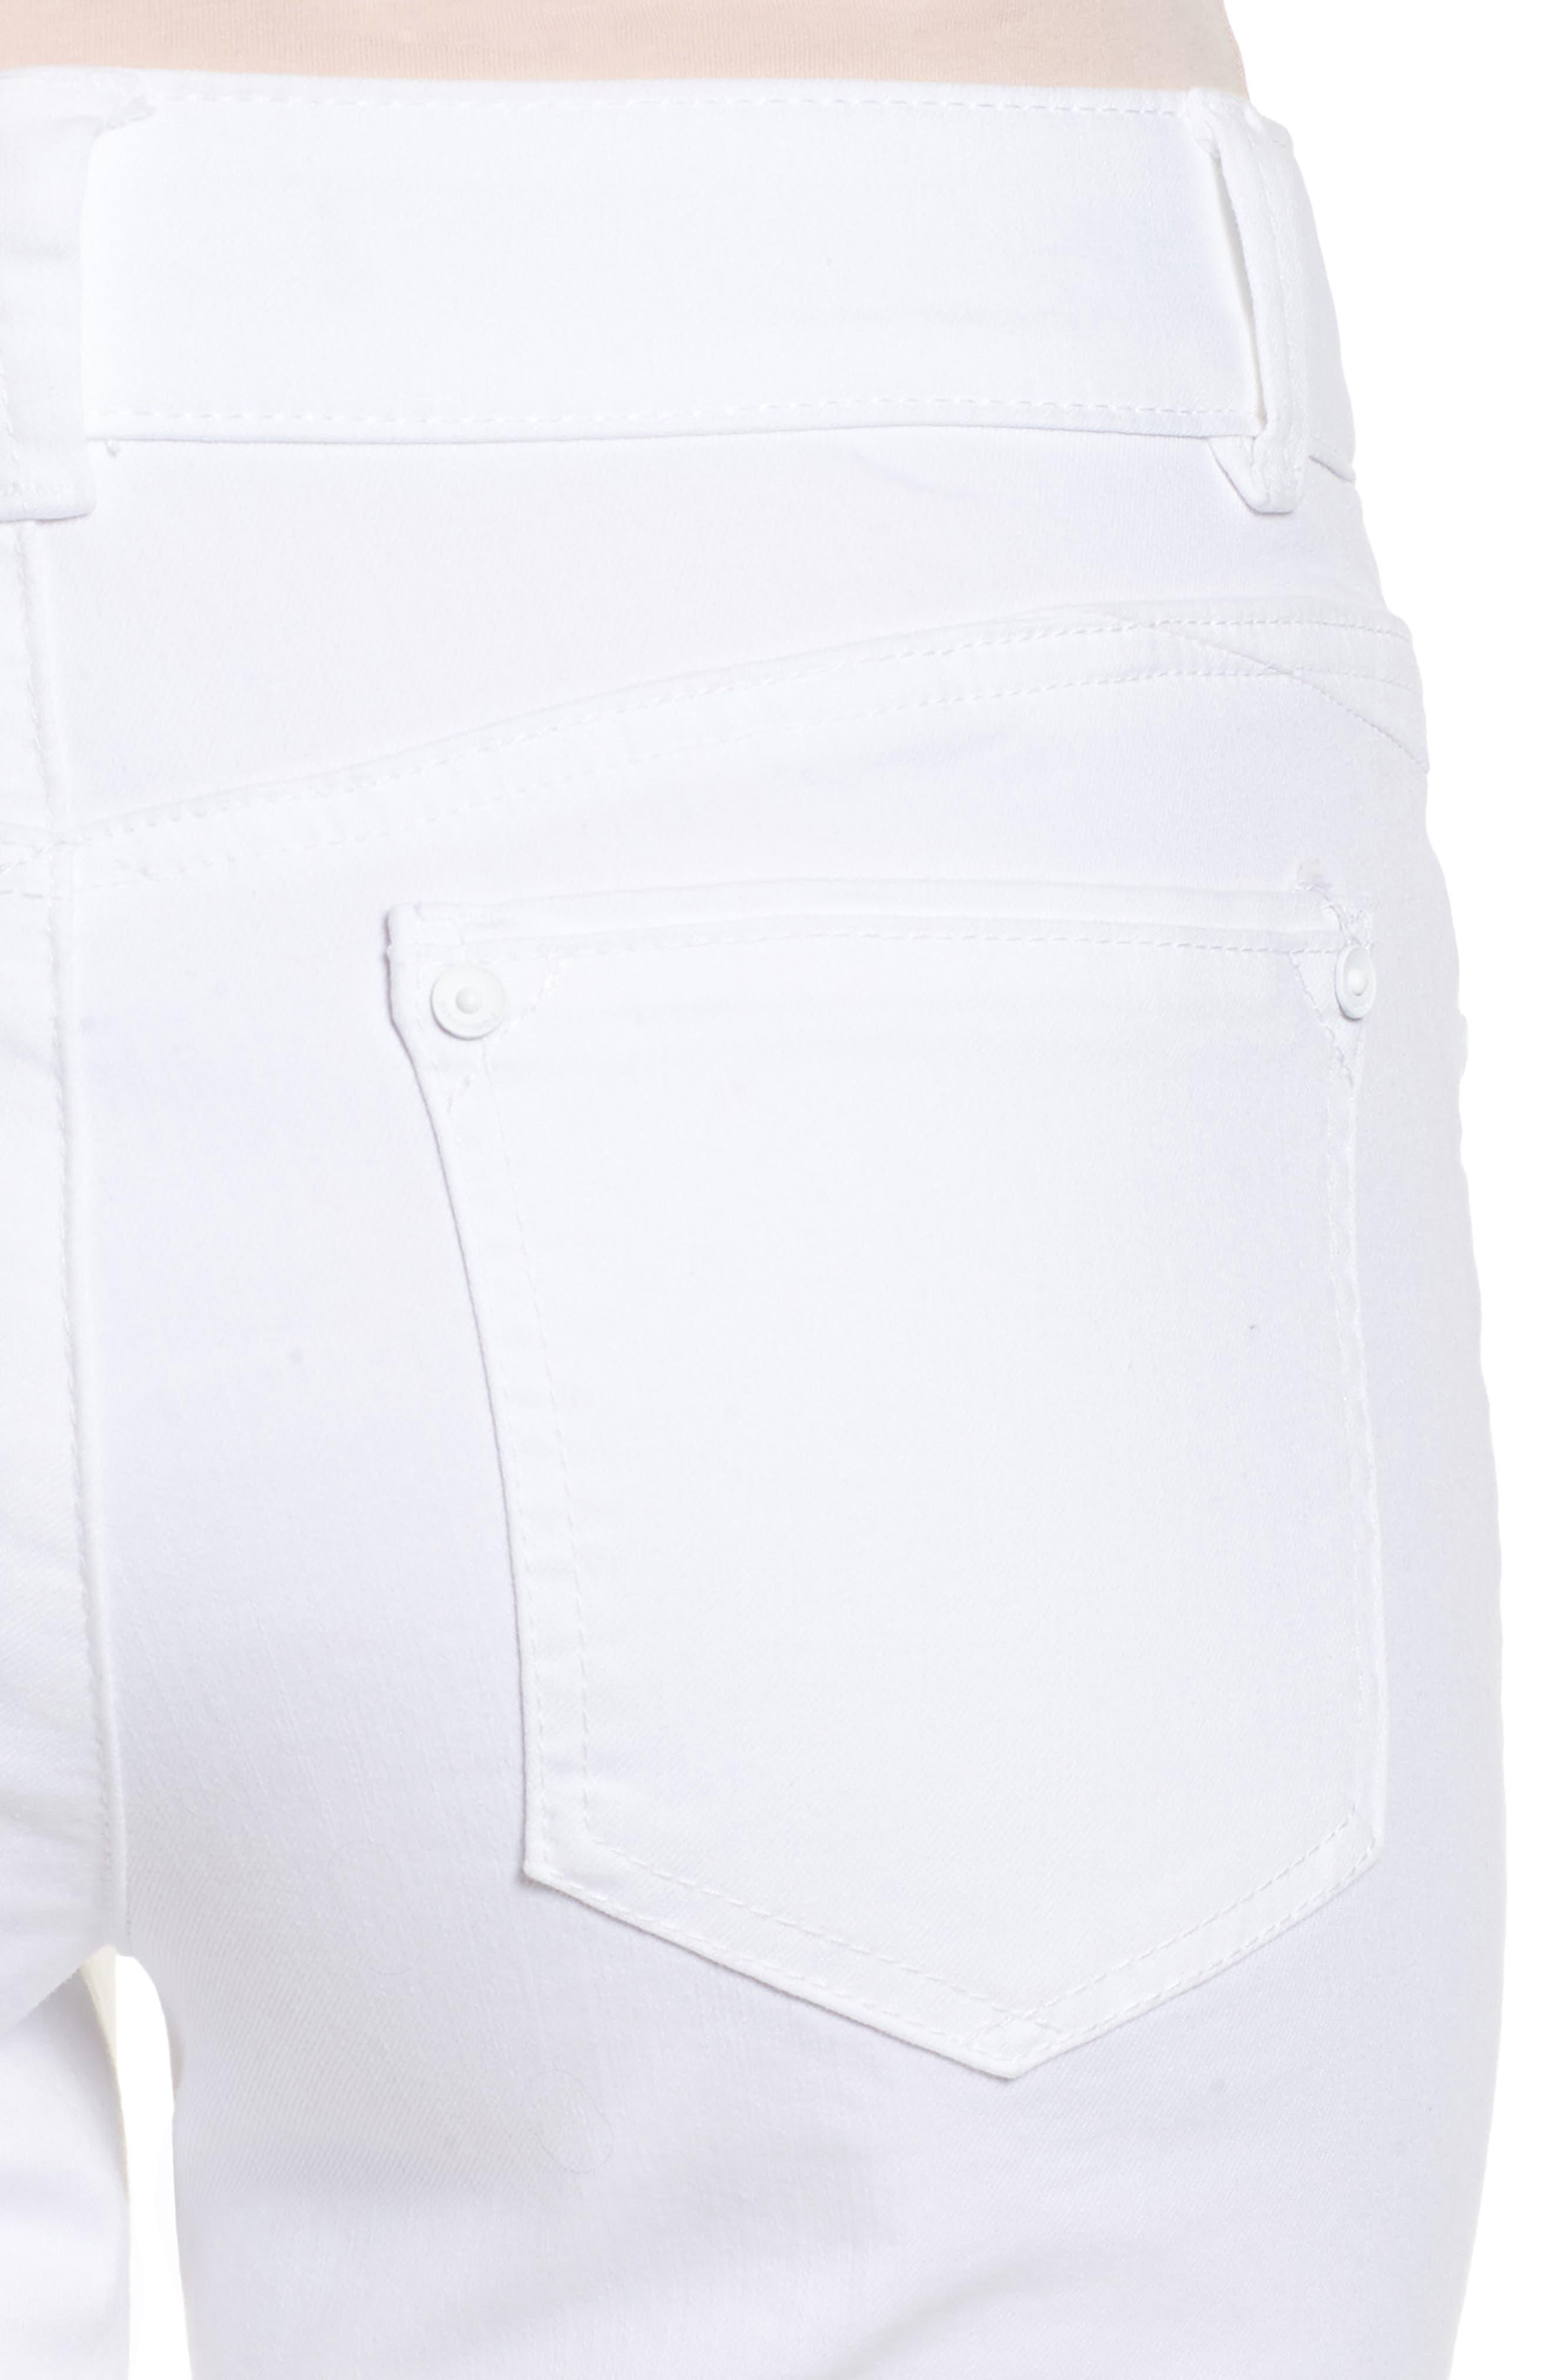 Ab-solution Ankle Skimmer Jeans,                             Alternate thumbnail 4, color,